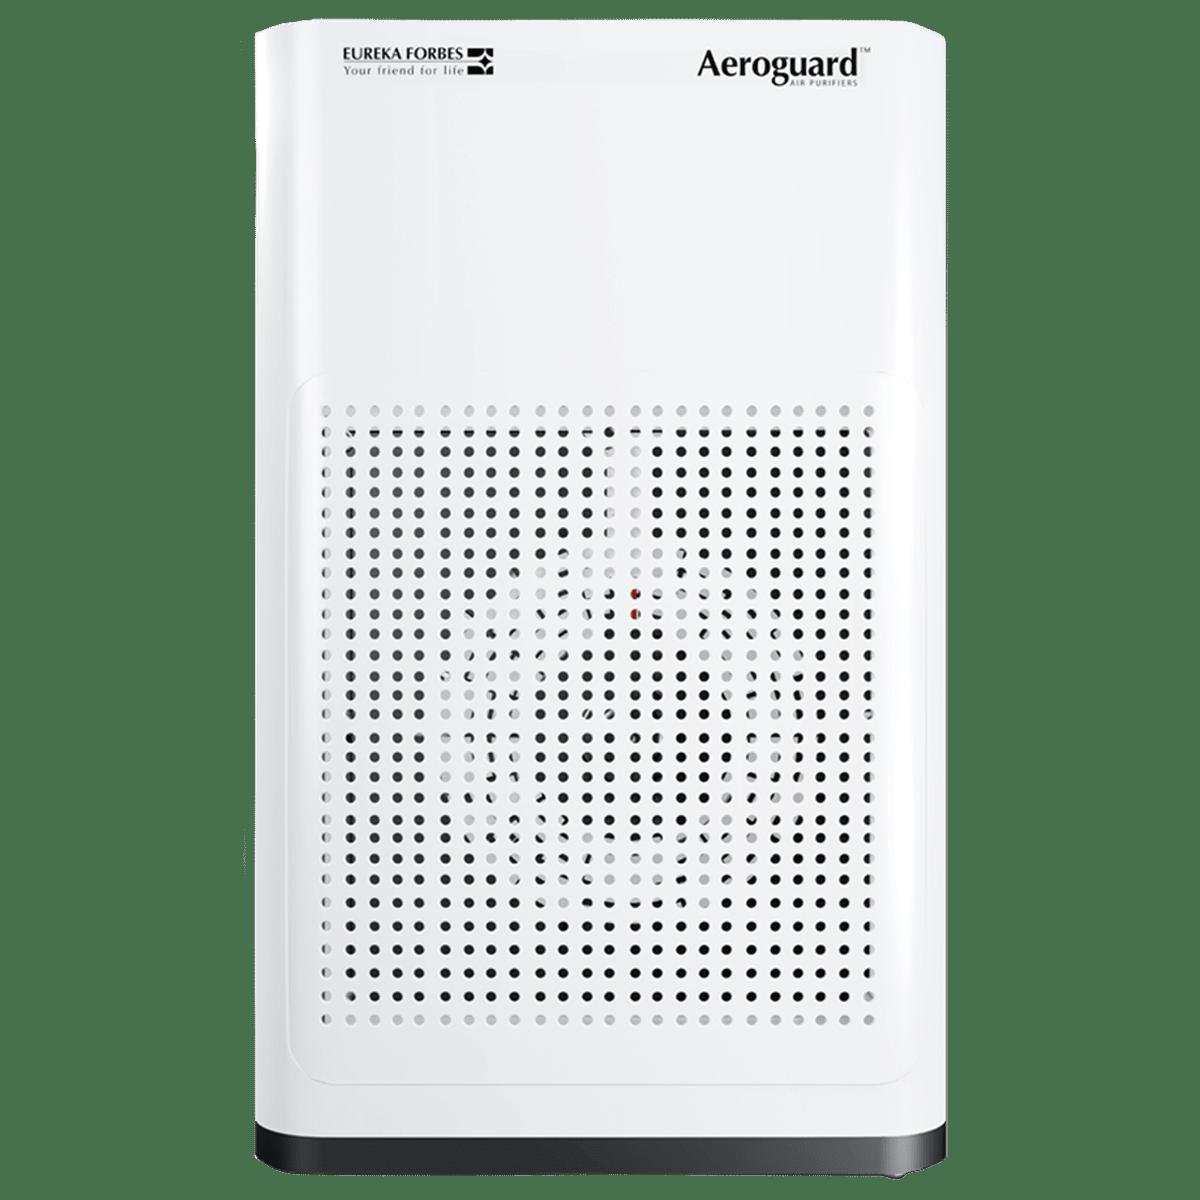 Eureka Forbes Aeroguard AP 700EX FilterMaxx Technology Air Purifier (H1N1 Swine Flu Resistant Filter, GAPDAP700EX000, White)